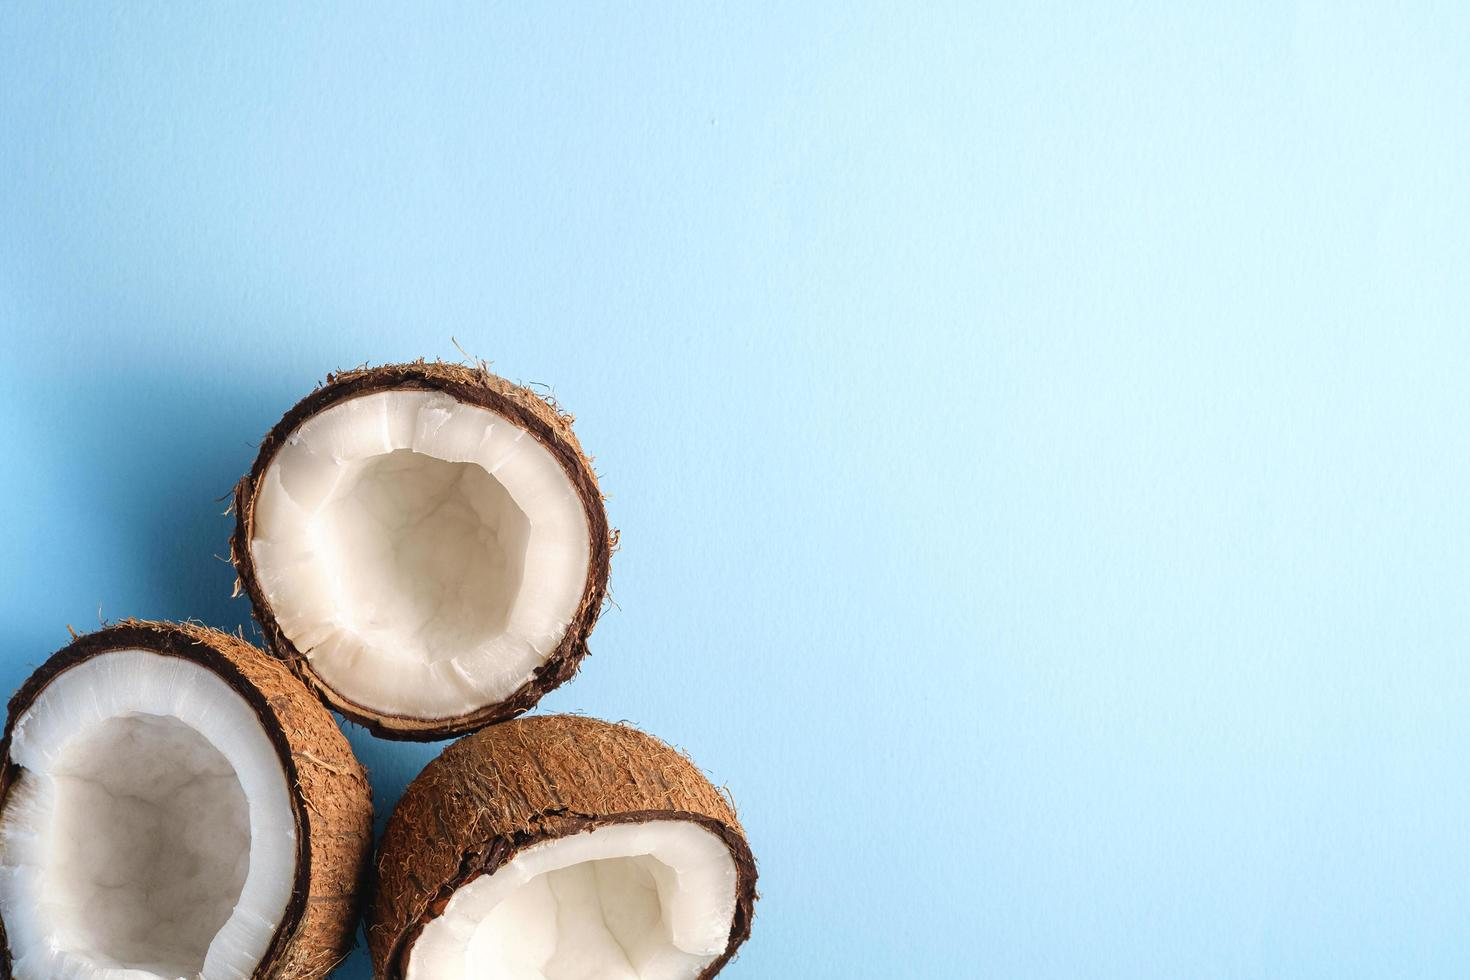 Coconuts on blue vibrant plain background photo